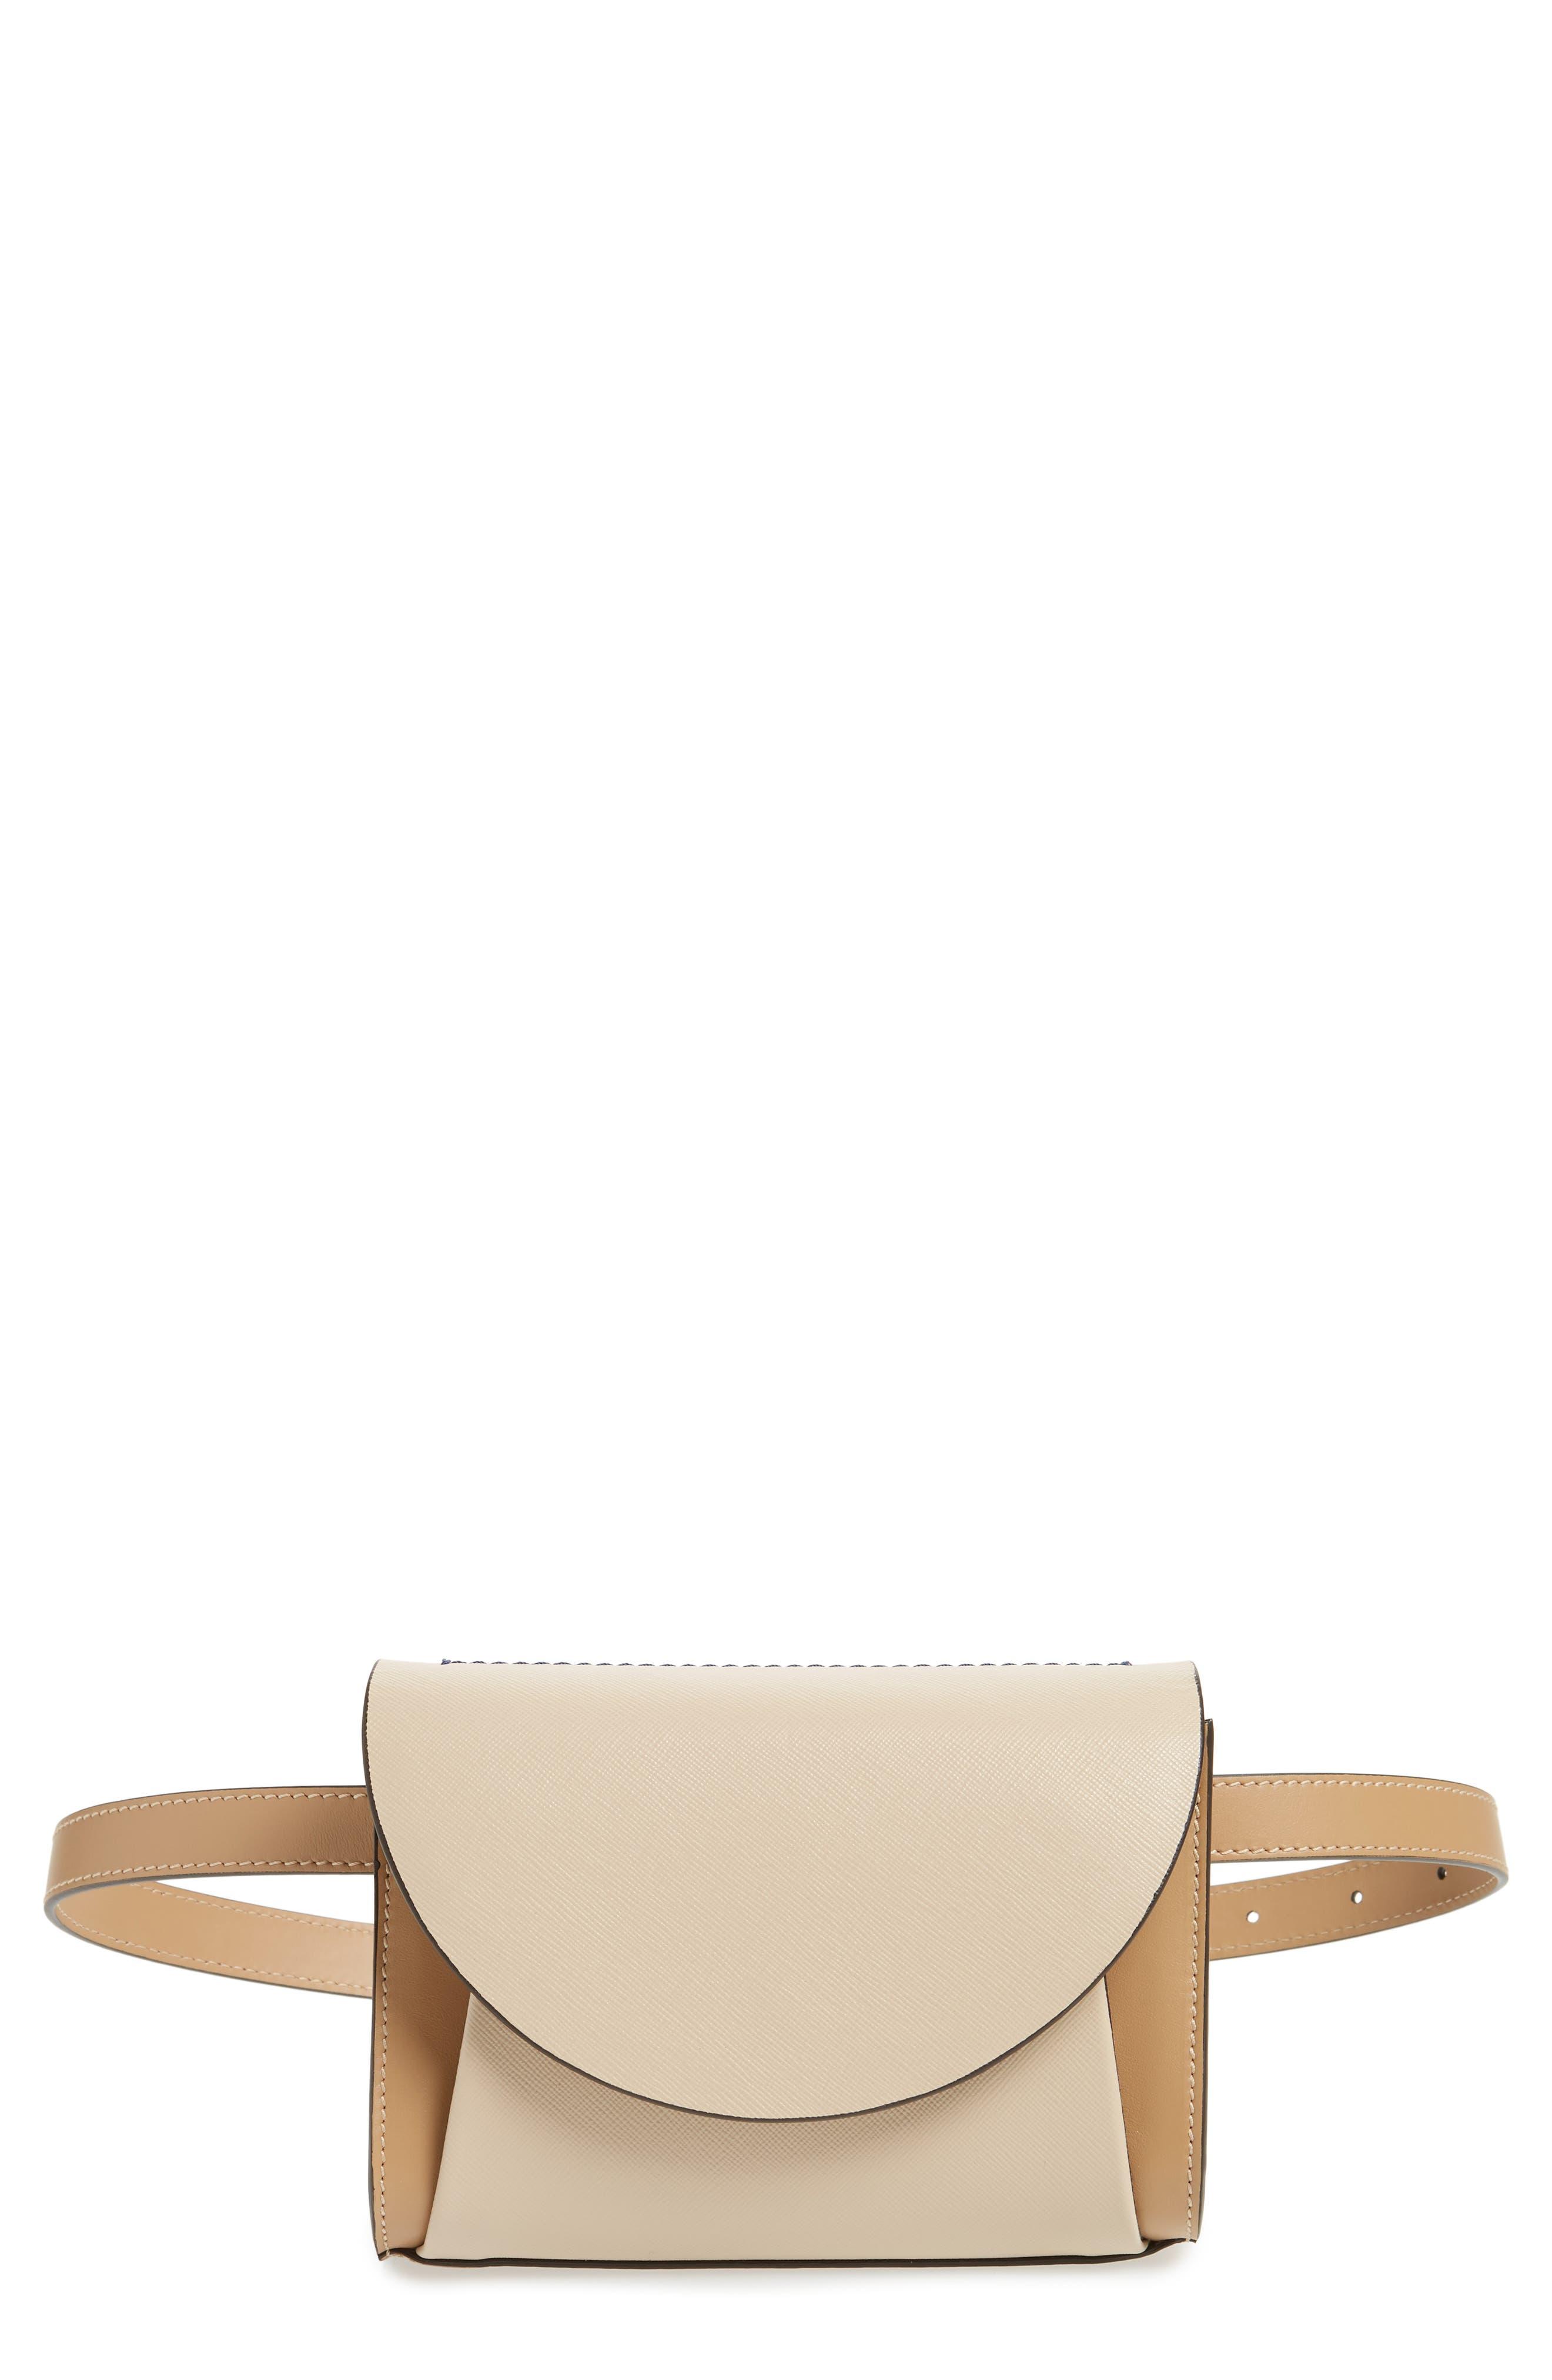 0c83e959de67 Women s Marni Designer Crossbody Bags